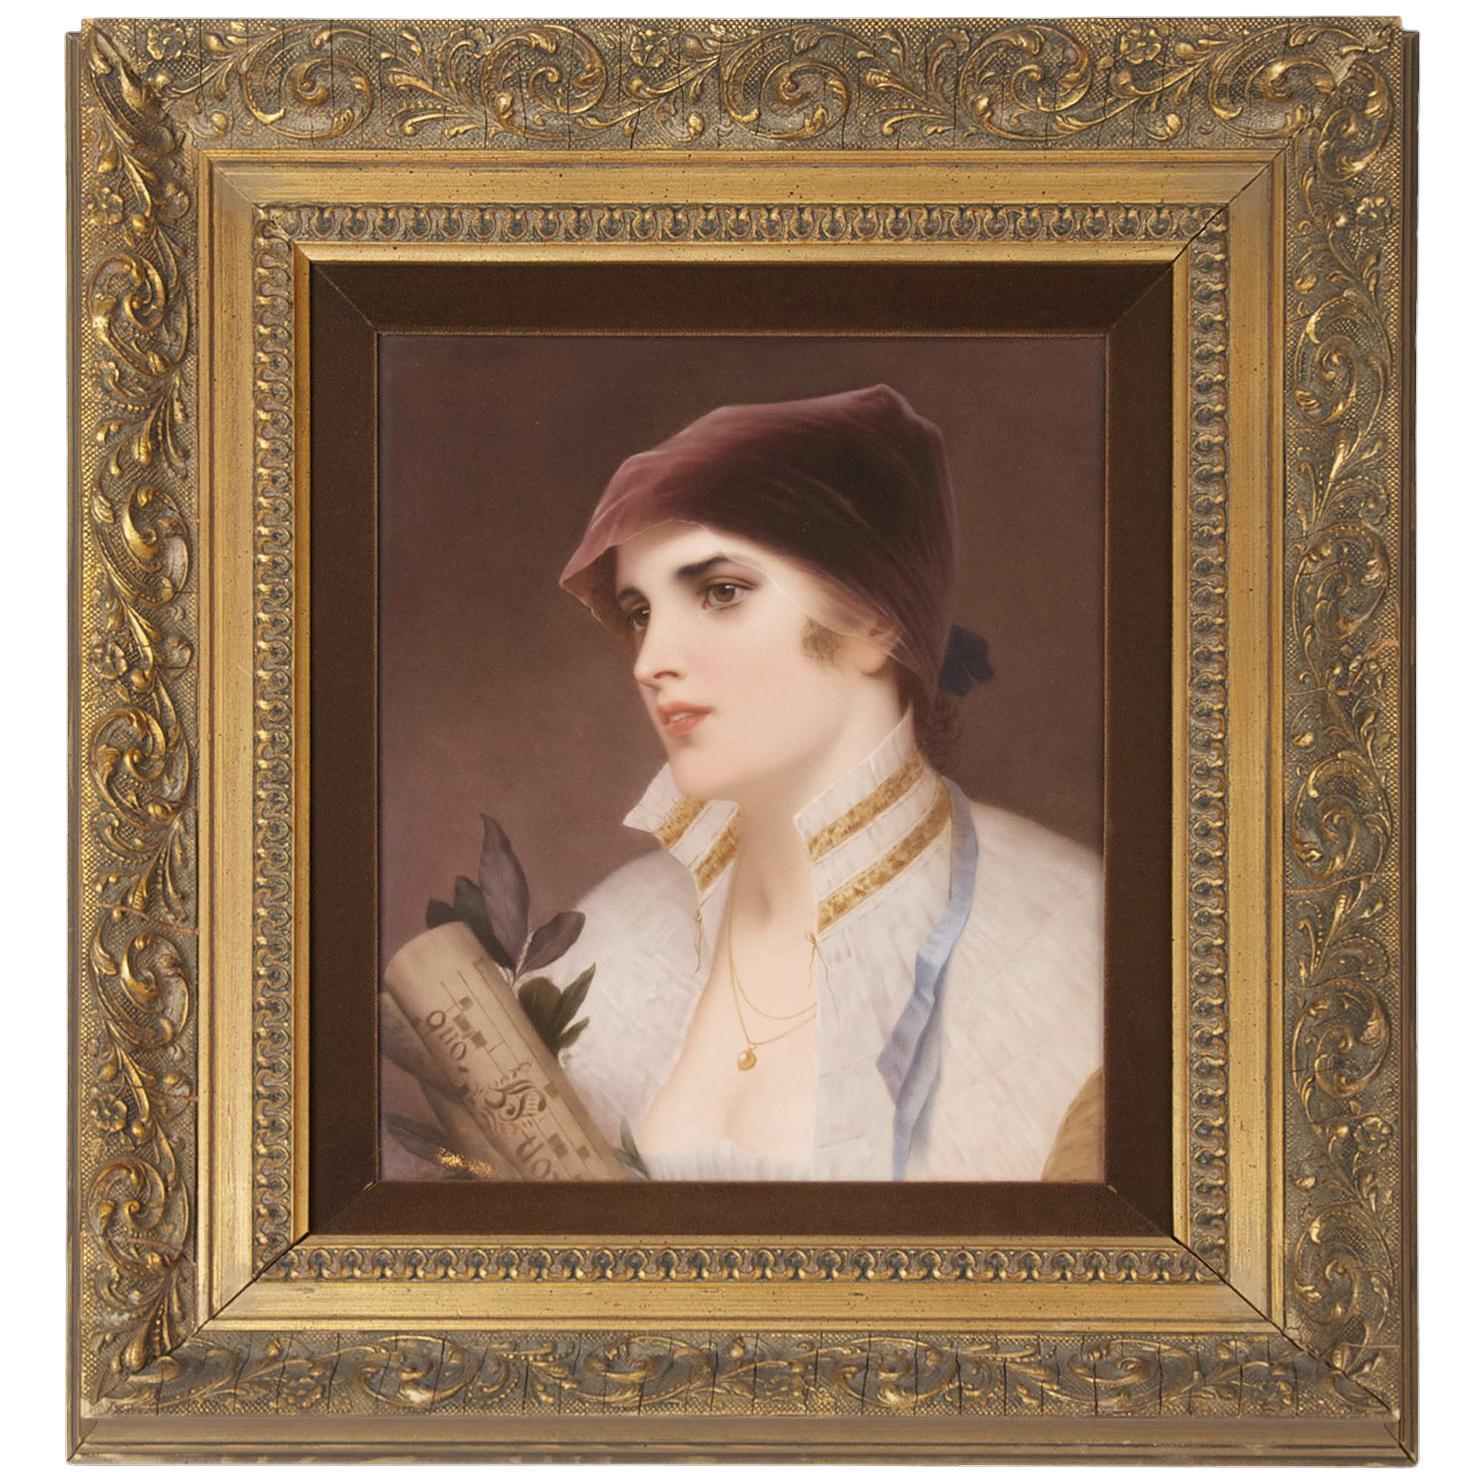 Very Fine KPM Porcelain Plaque of a Young Woman, circa 1890